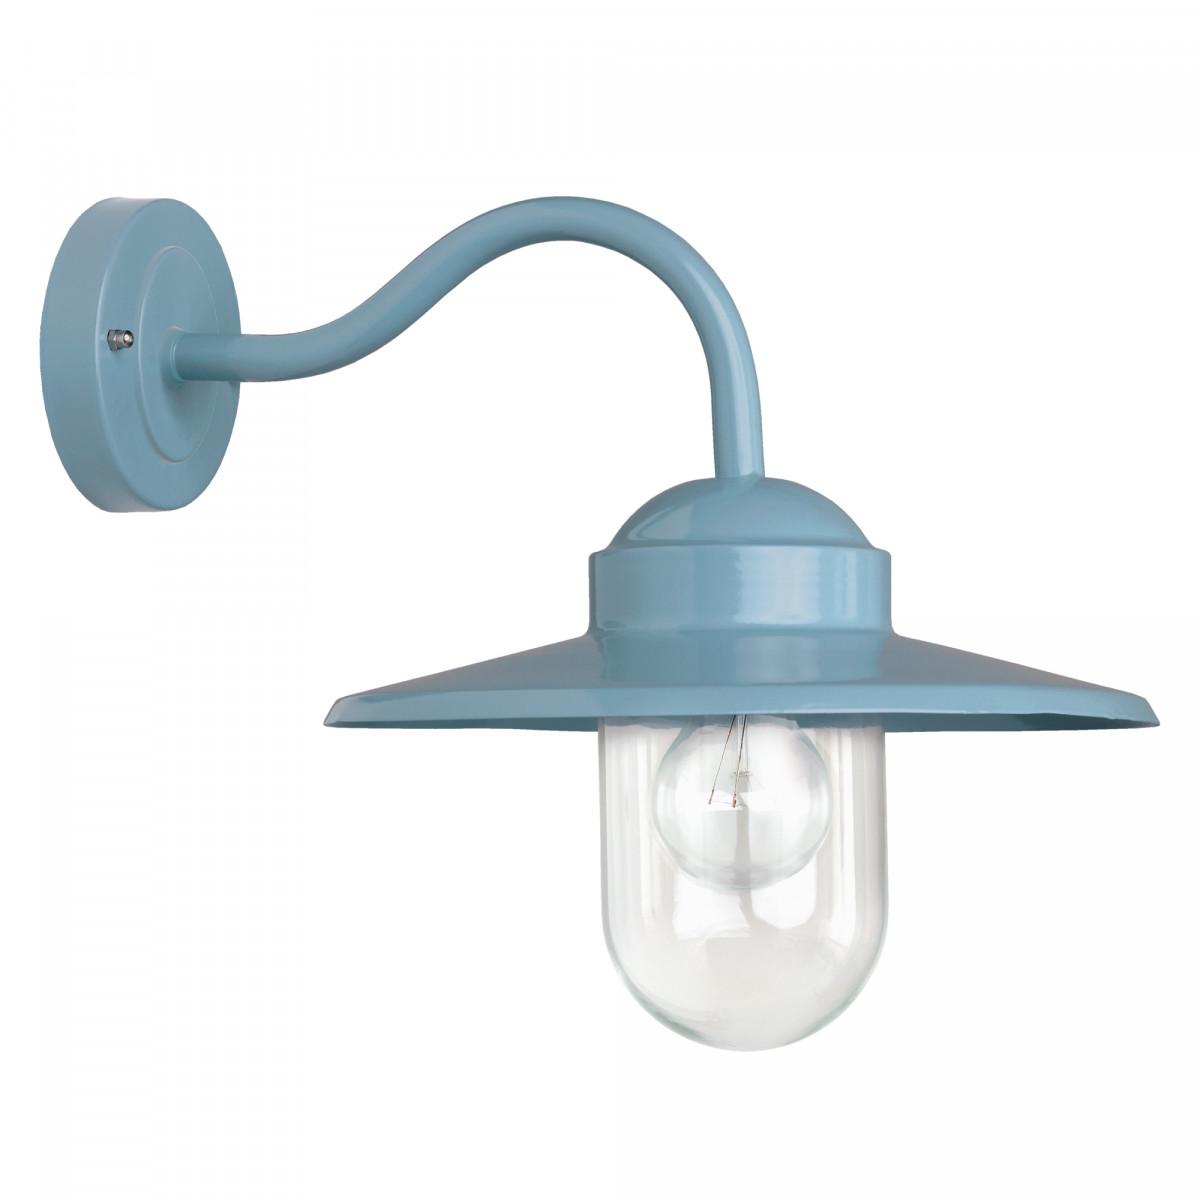 Dolce Auβenlampe Retro Blau, 7377